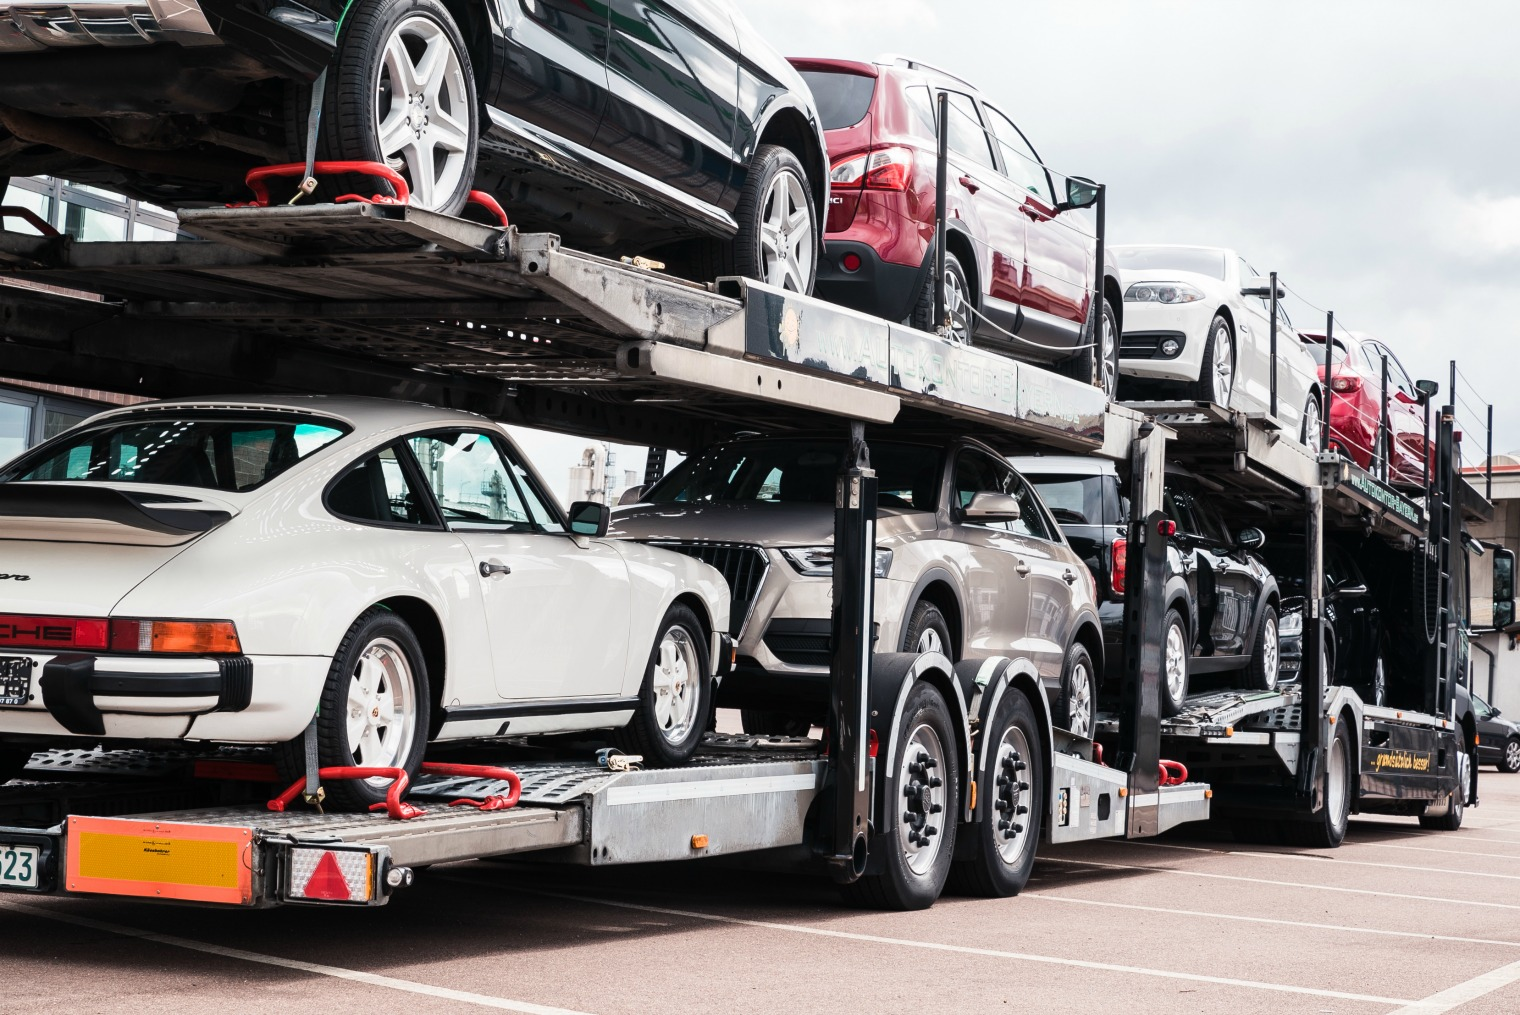 AUTO1.com aste di auto usate